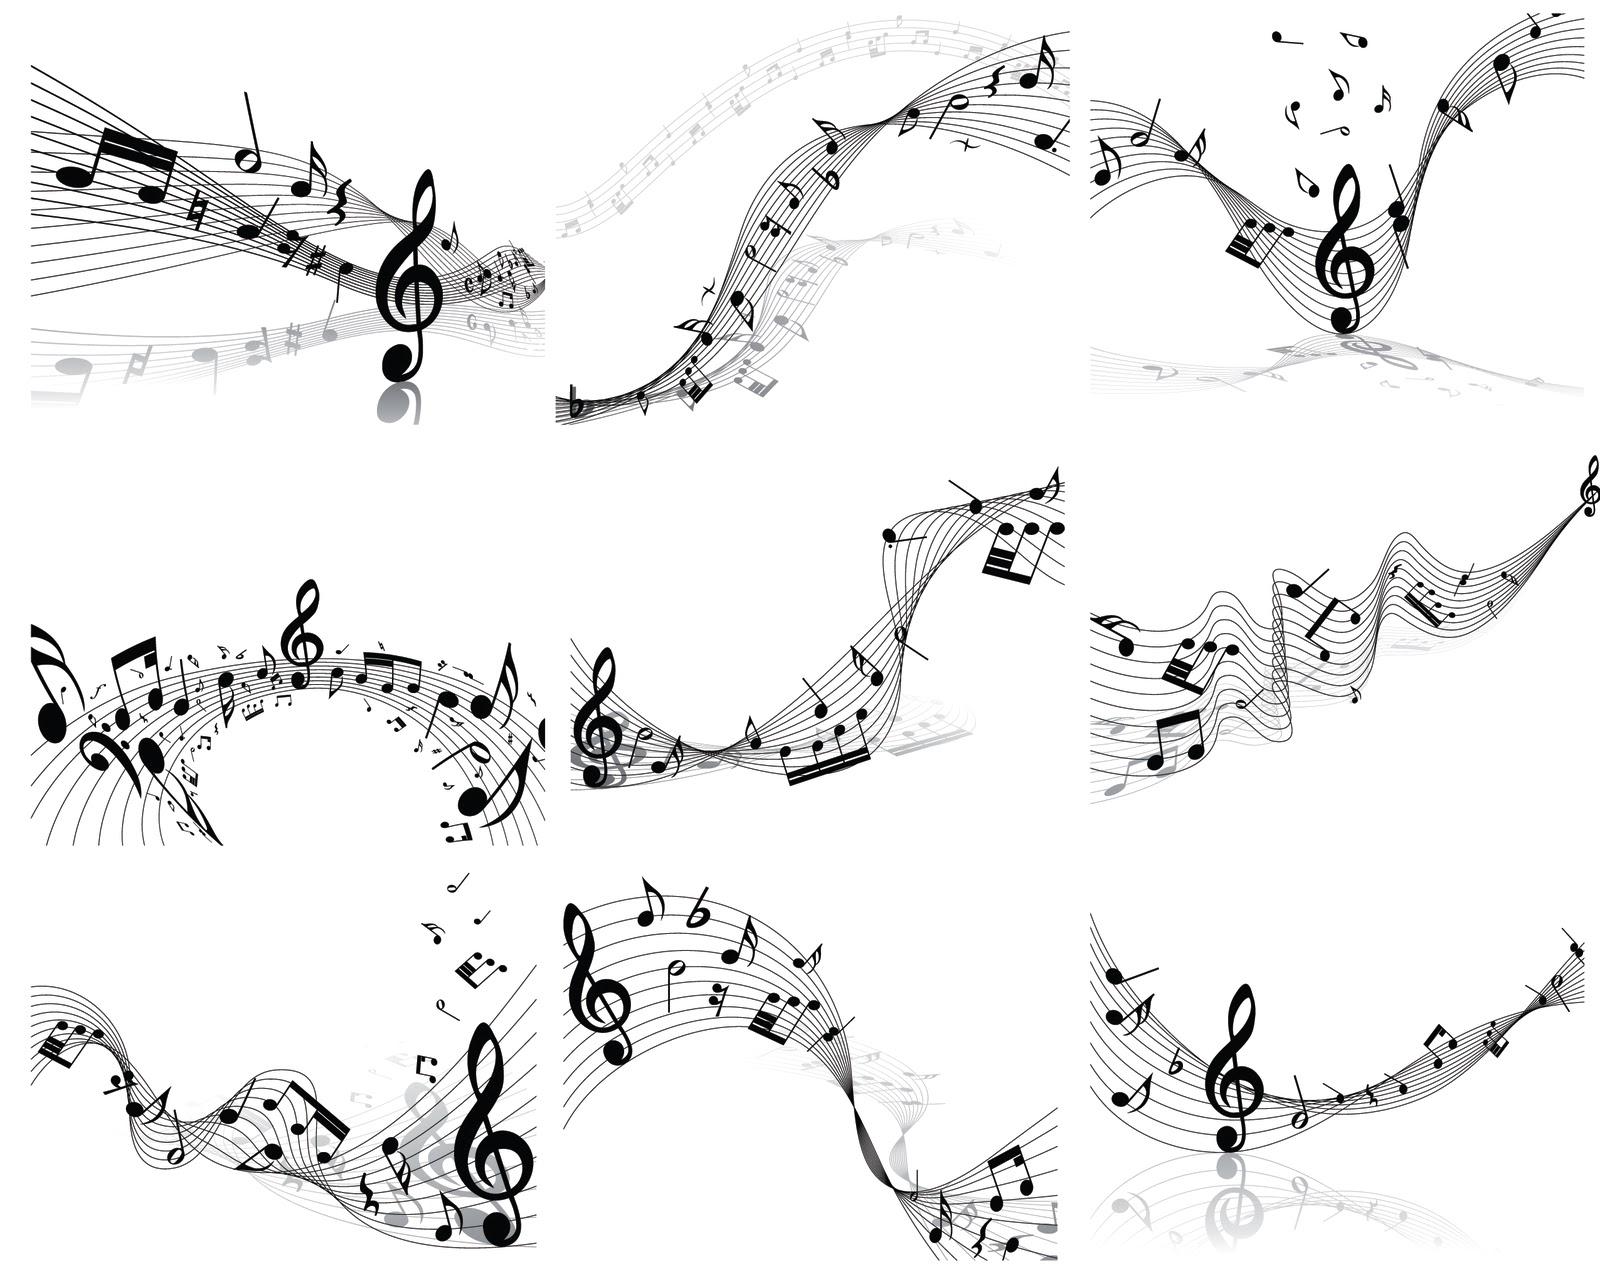 musicales y pentagrama en vector (Music Score and notes in vector ...